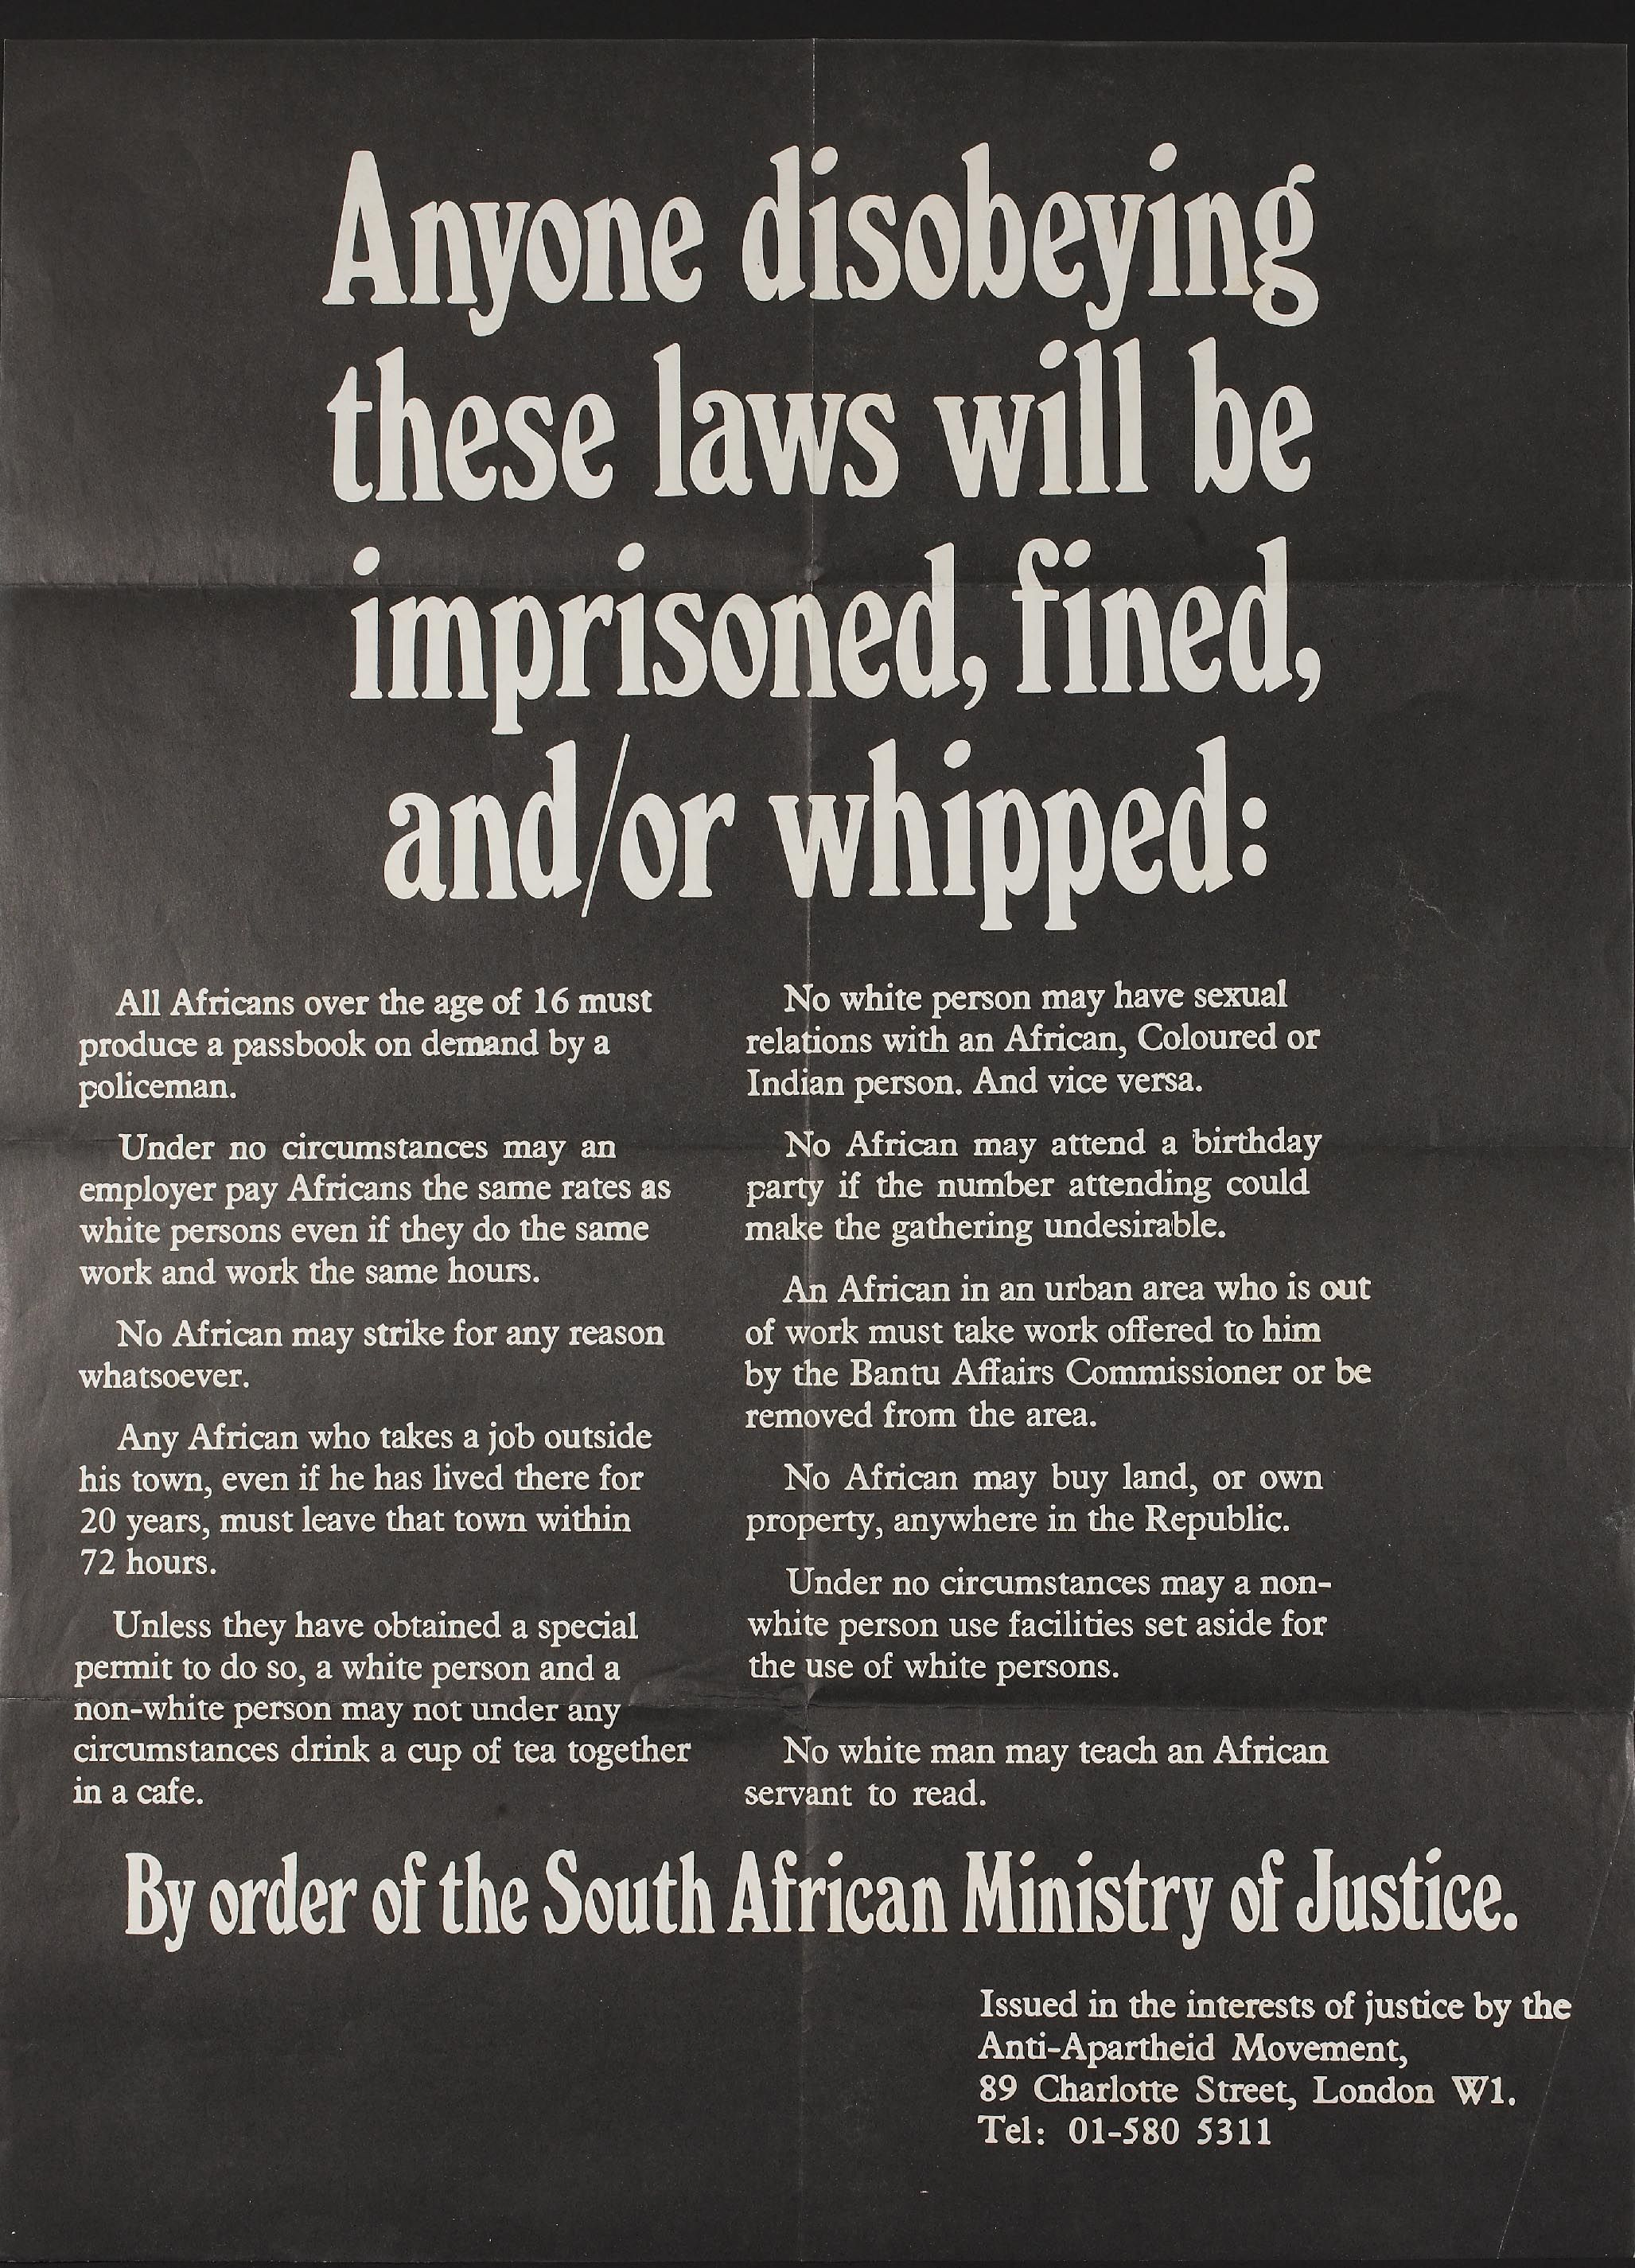 Apartheid South Africa